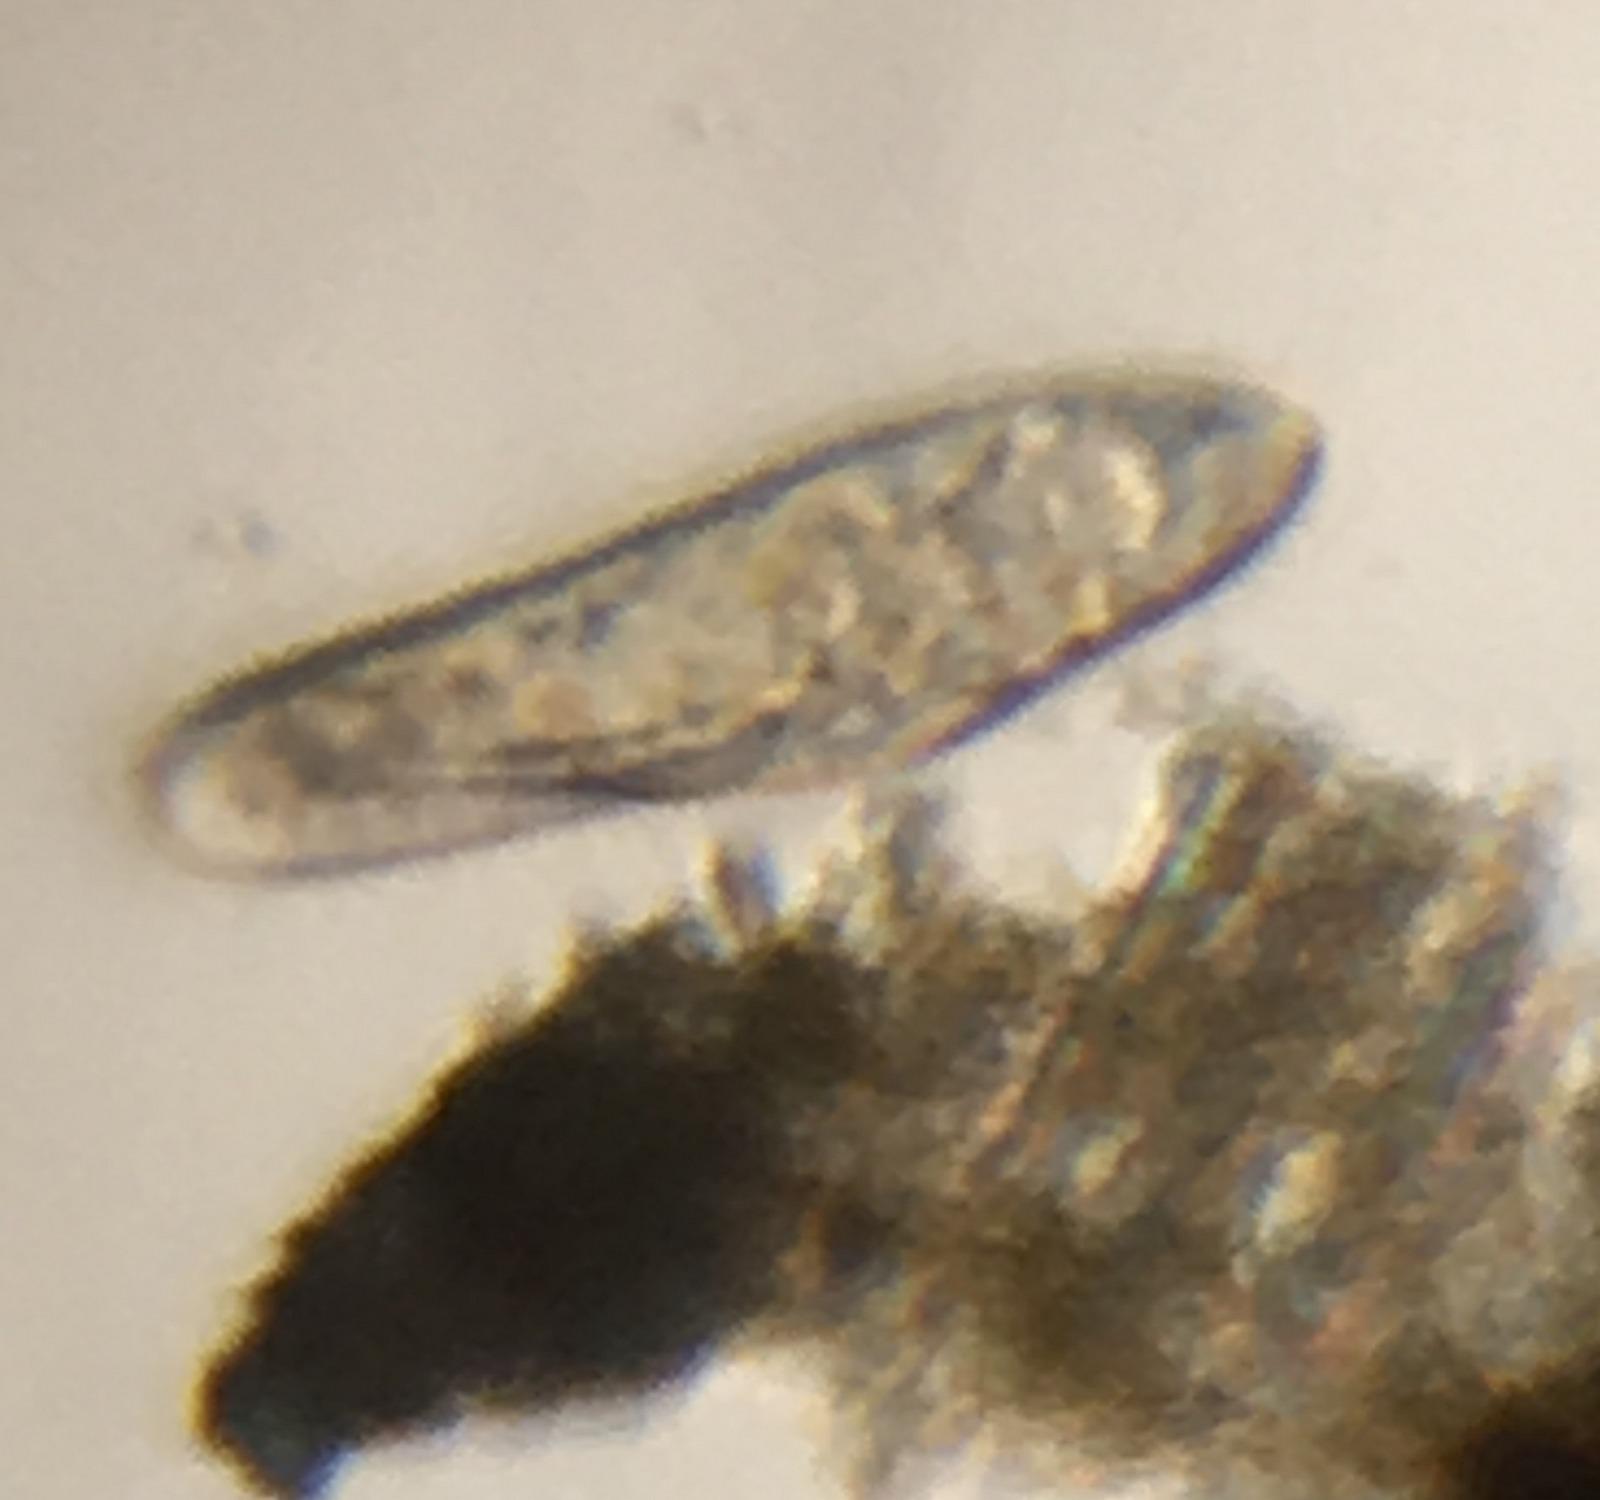 Ciliophora by Damon Tighe using Foldscope